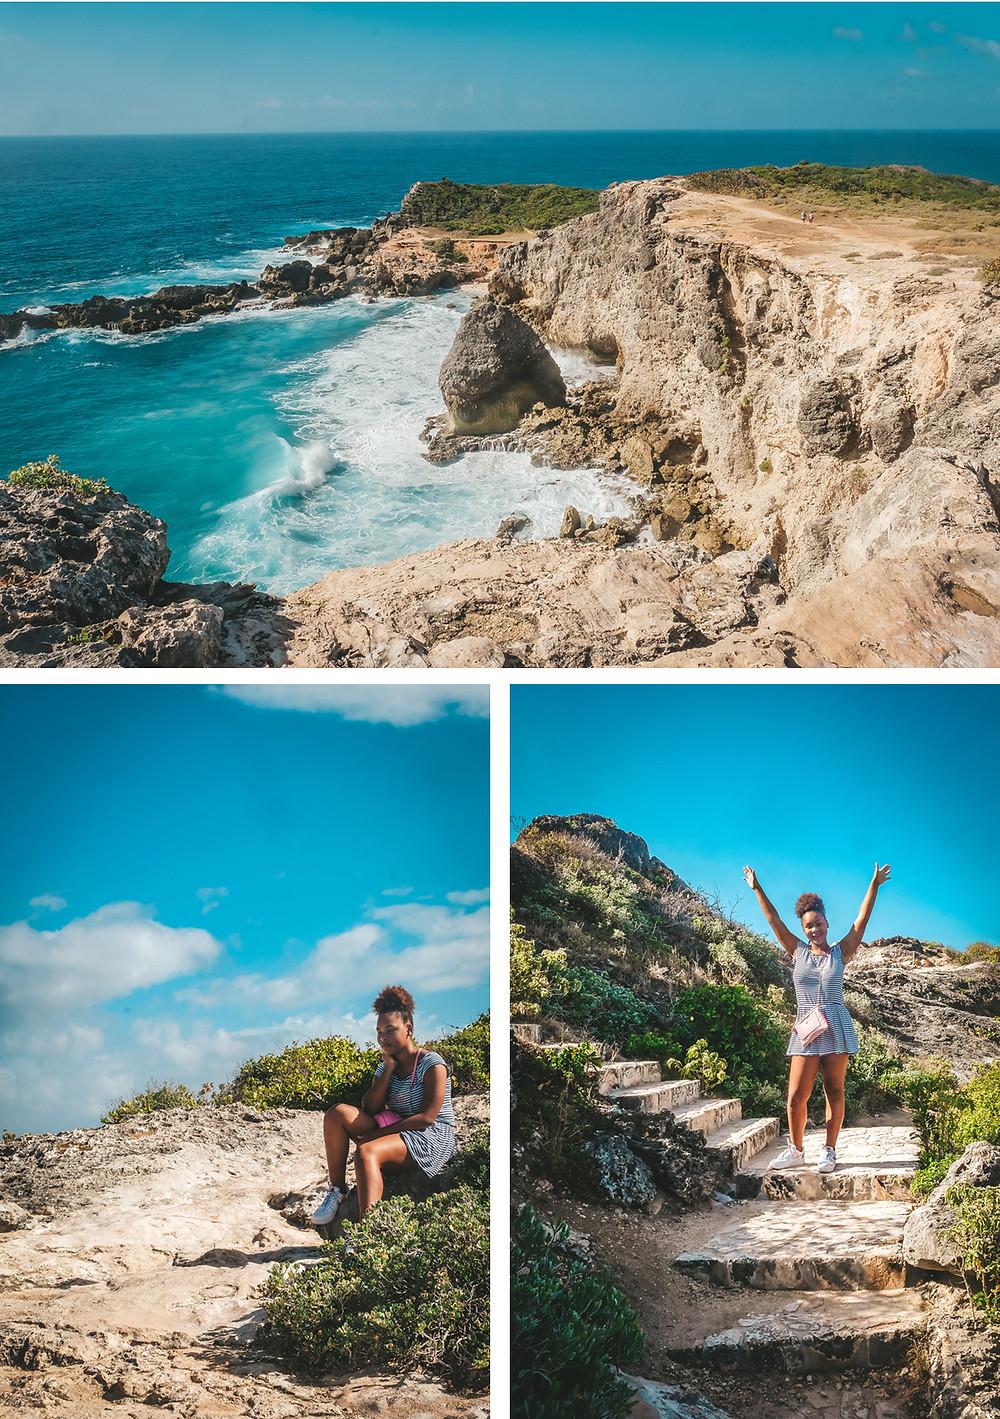 Pointe des Chateau Guadeloupe